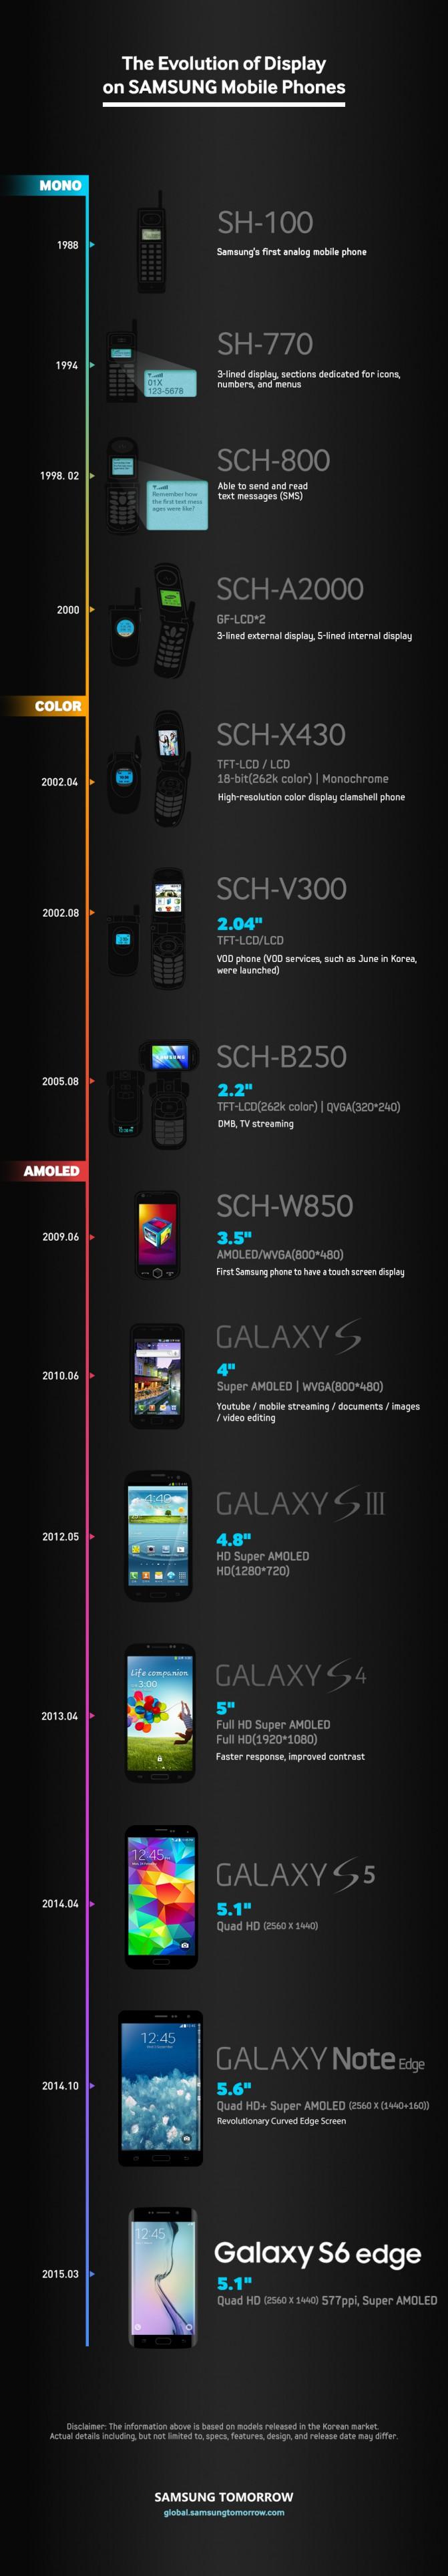 Evolution-of-Smartphone_Display